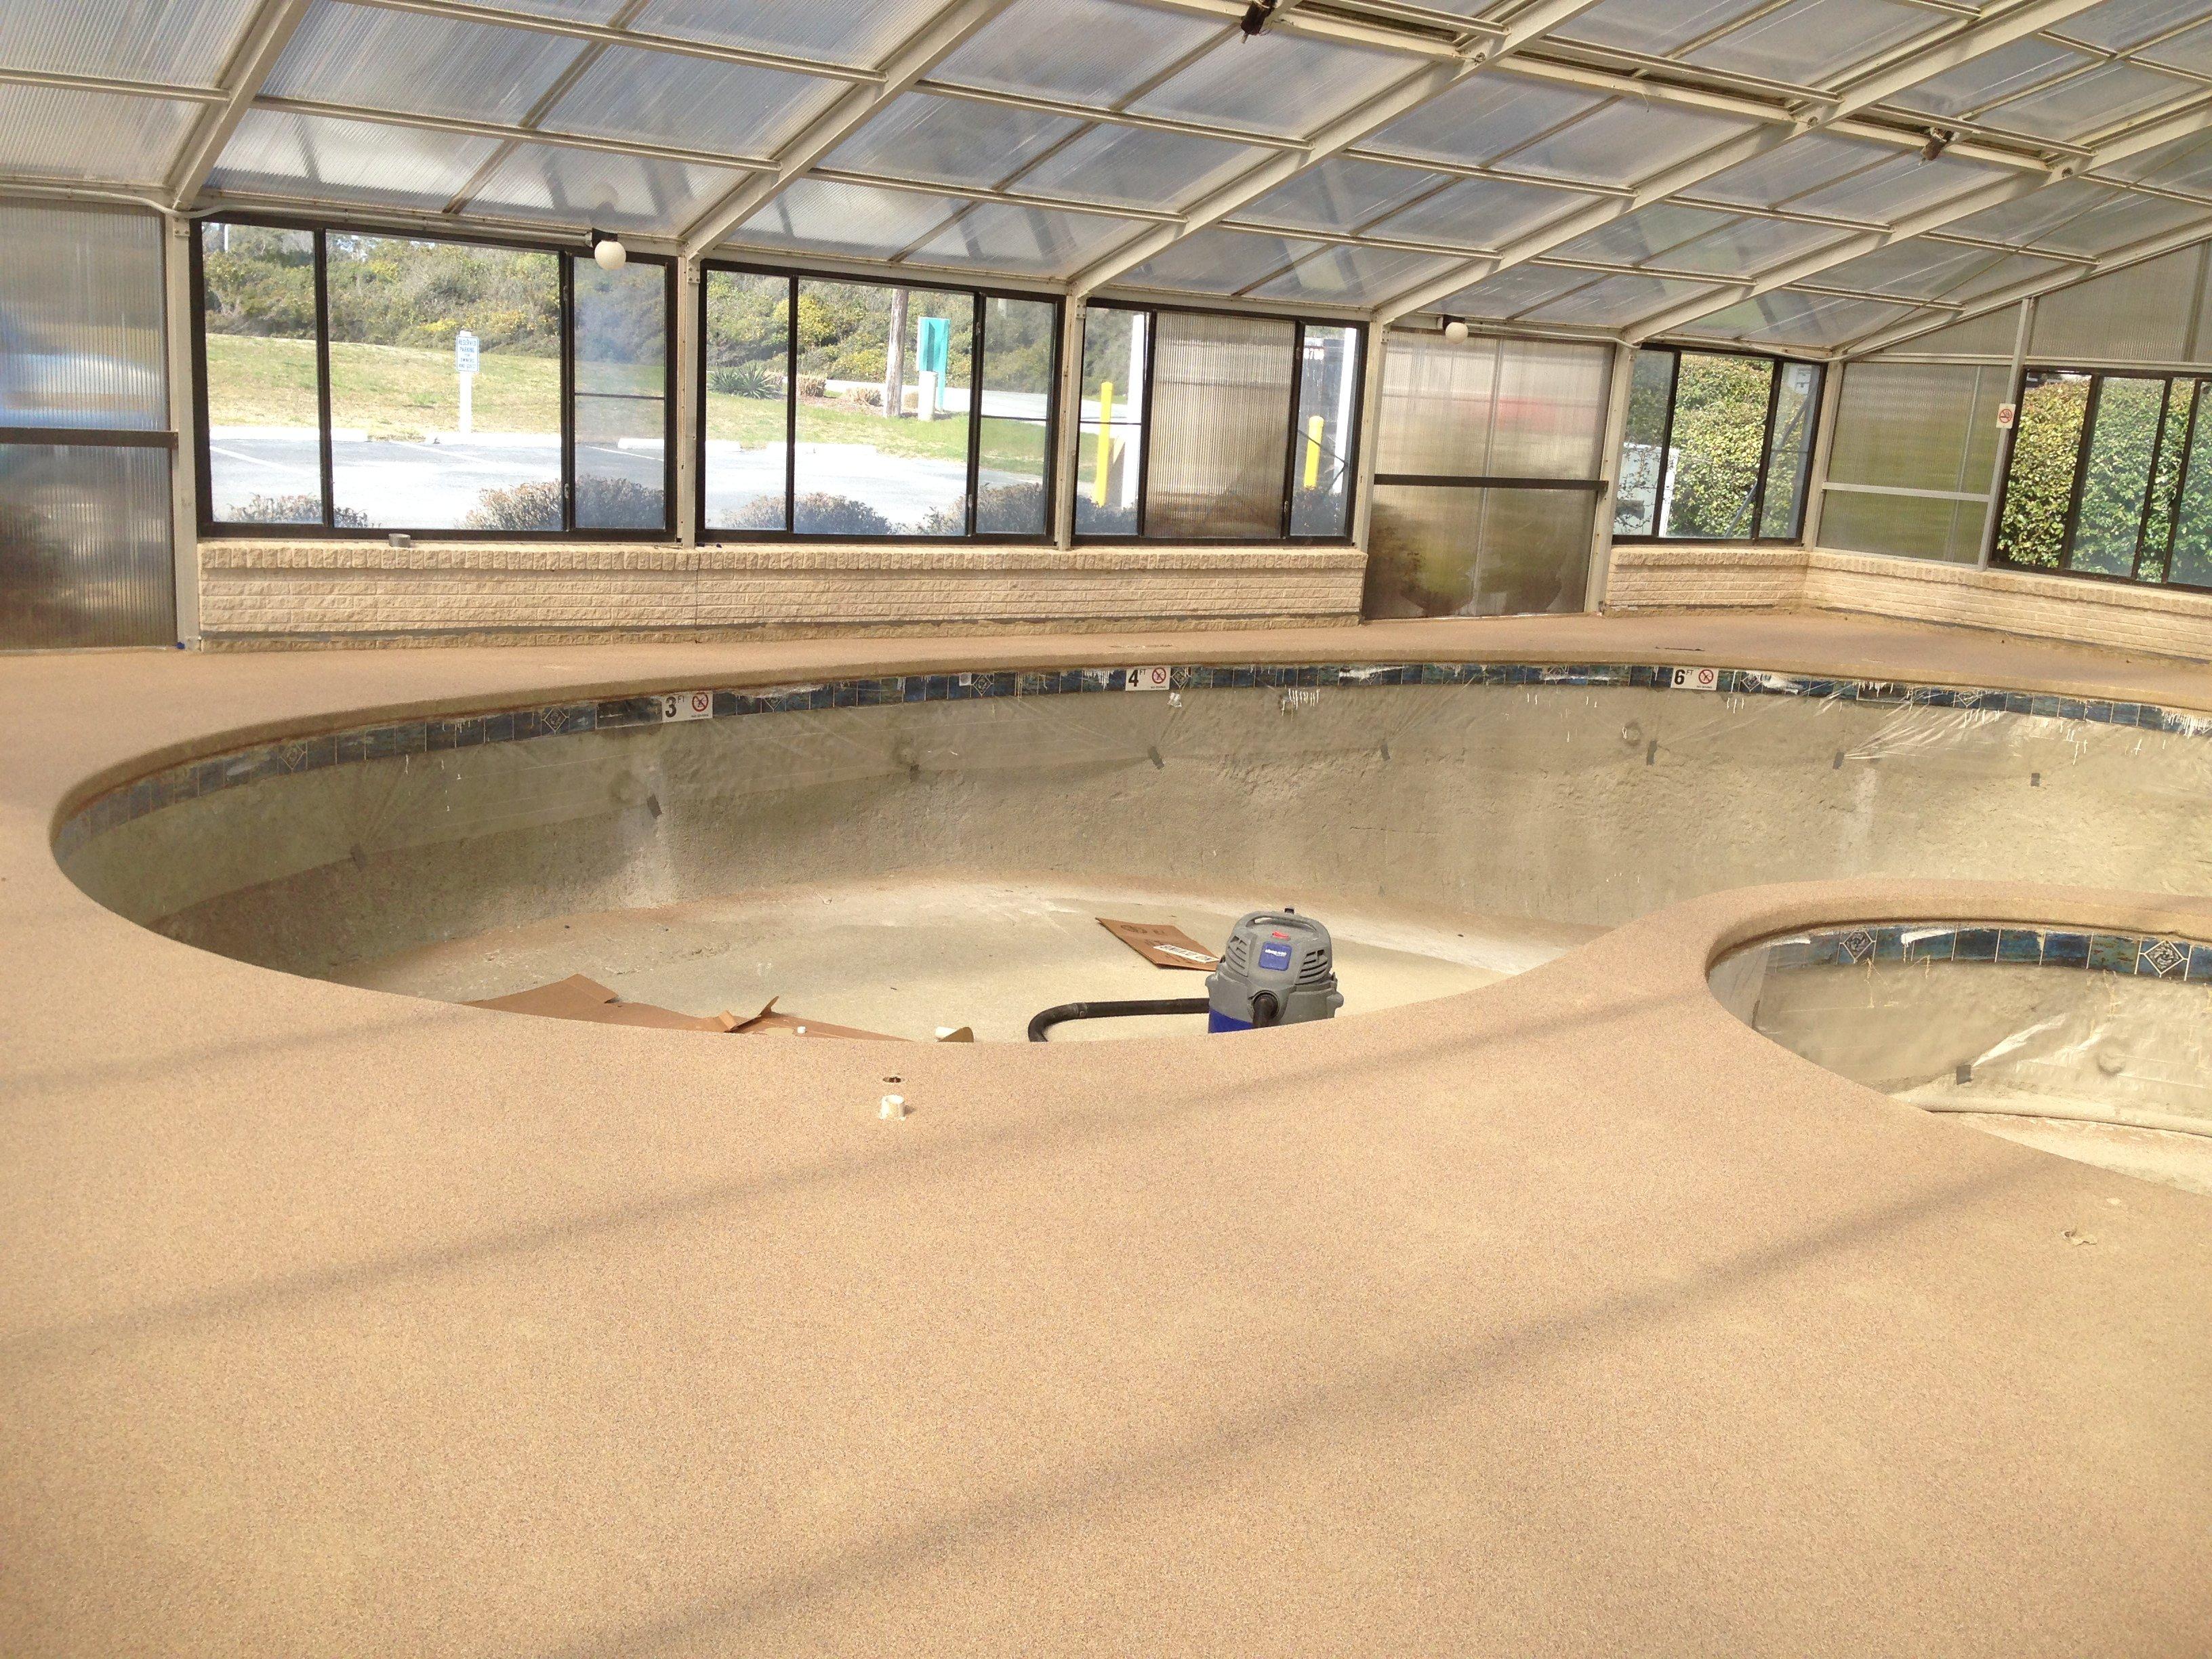 Applying Rubber Based Quartz Decking, New Waterline tile is installed